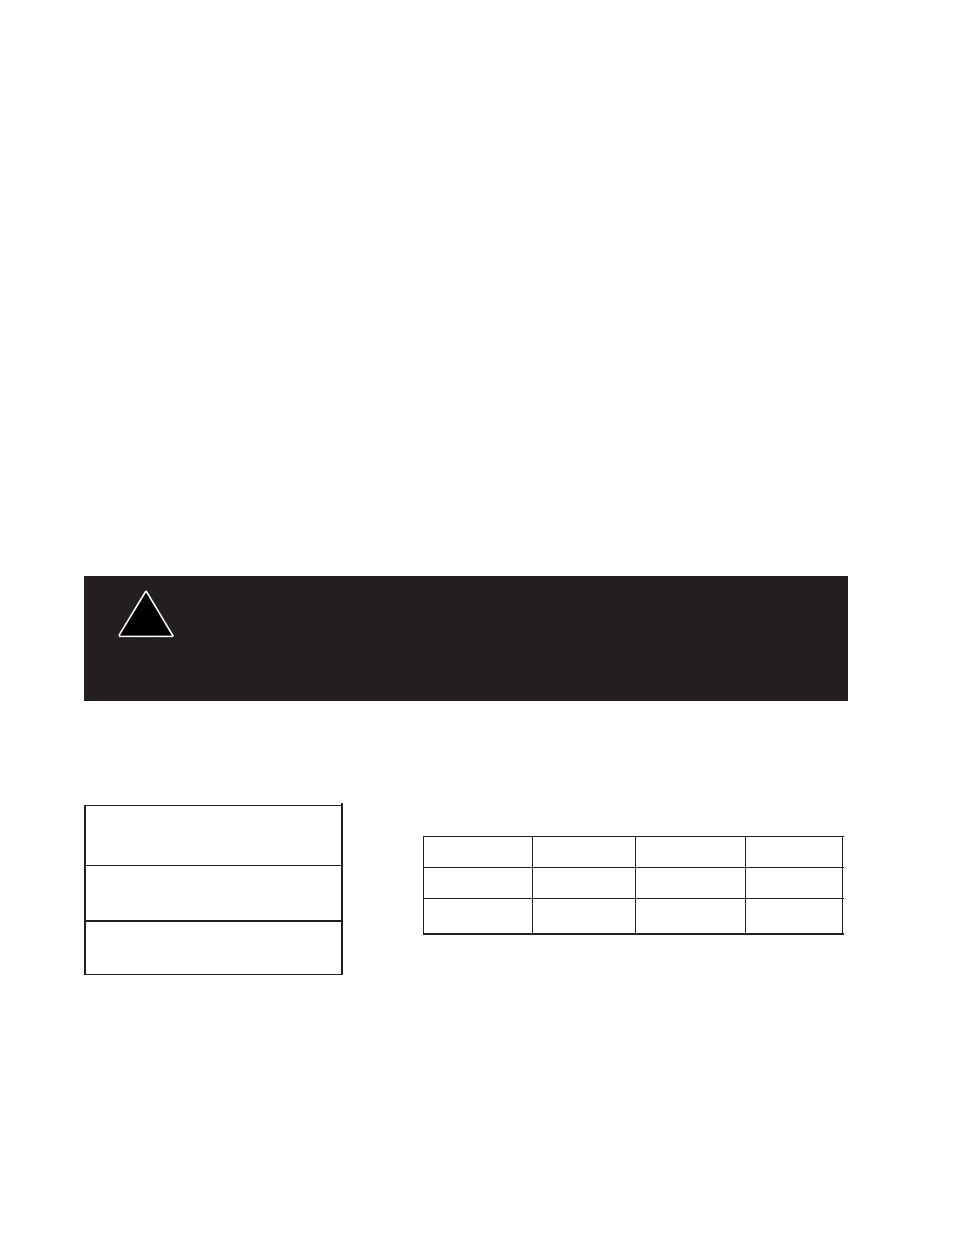 Code 3 Mx7000 Wiring Diagram \u0026 Code 3 Mx7000 Wiring Diagram \\\\u0026 .